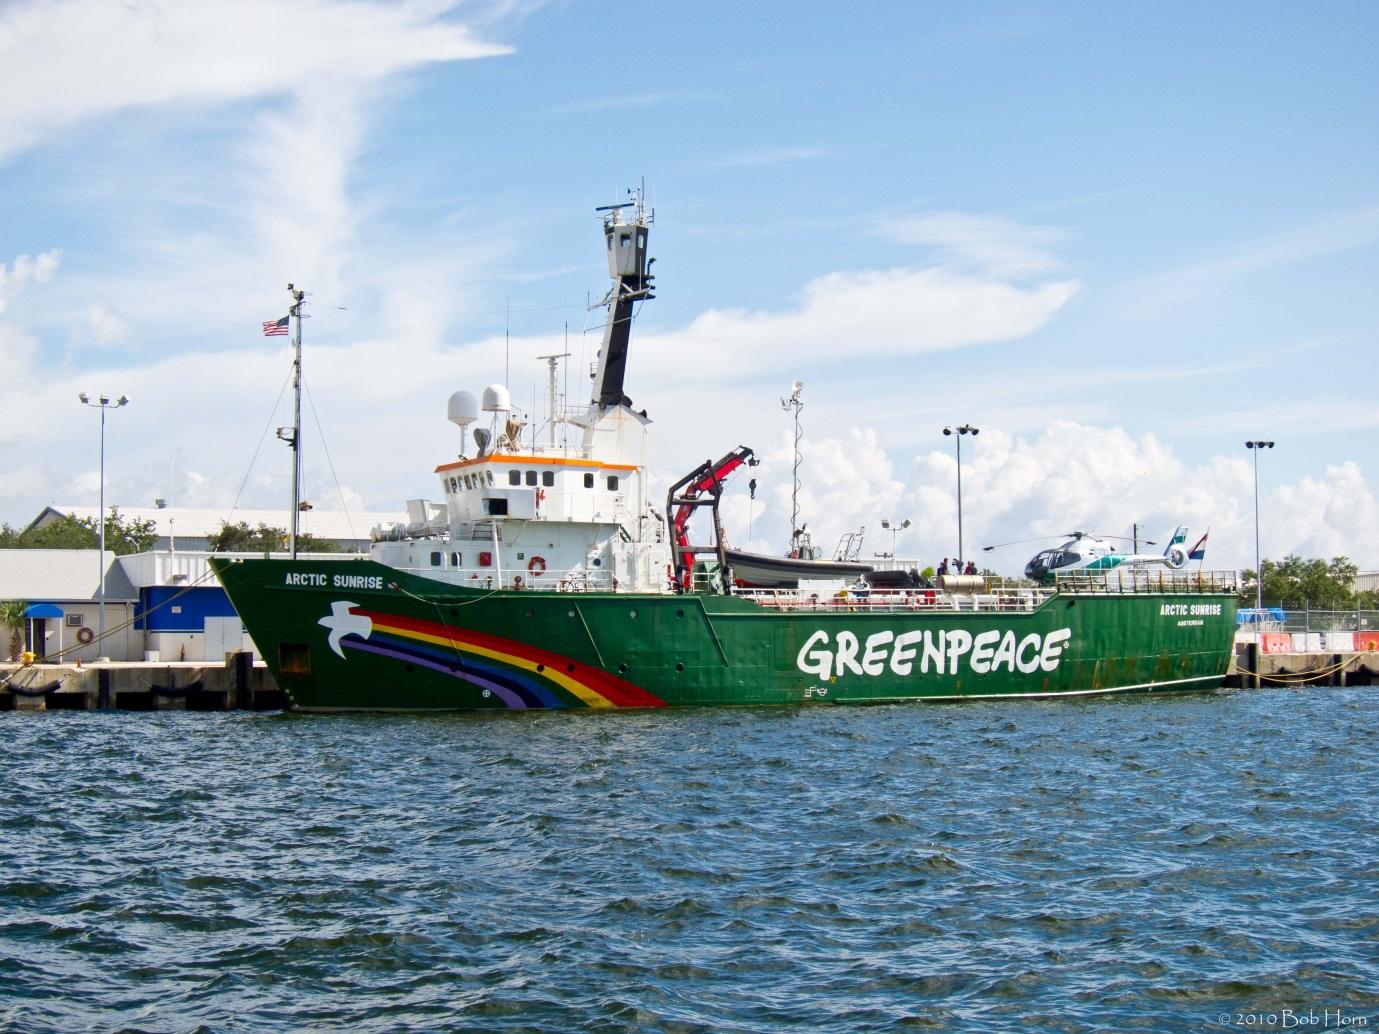 Greenpeacefartyg